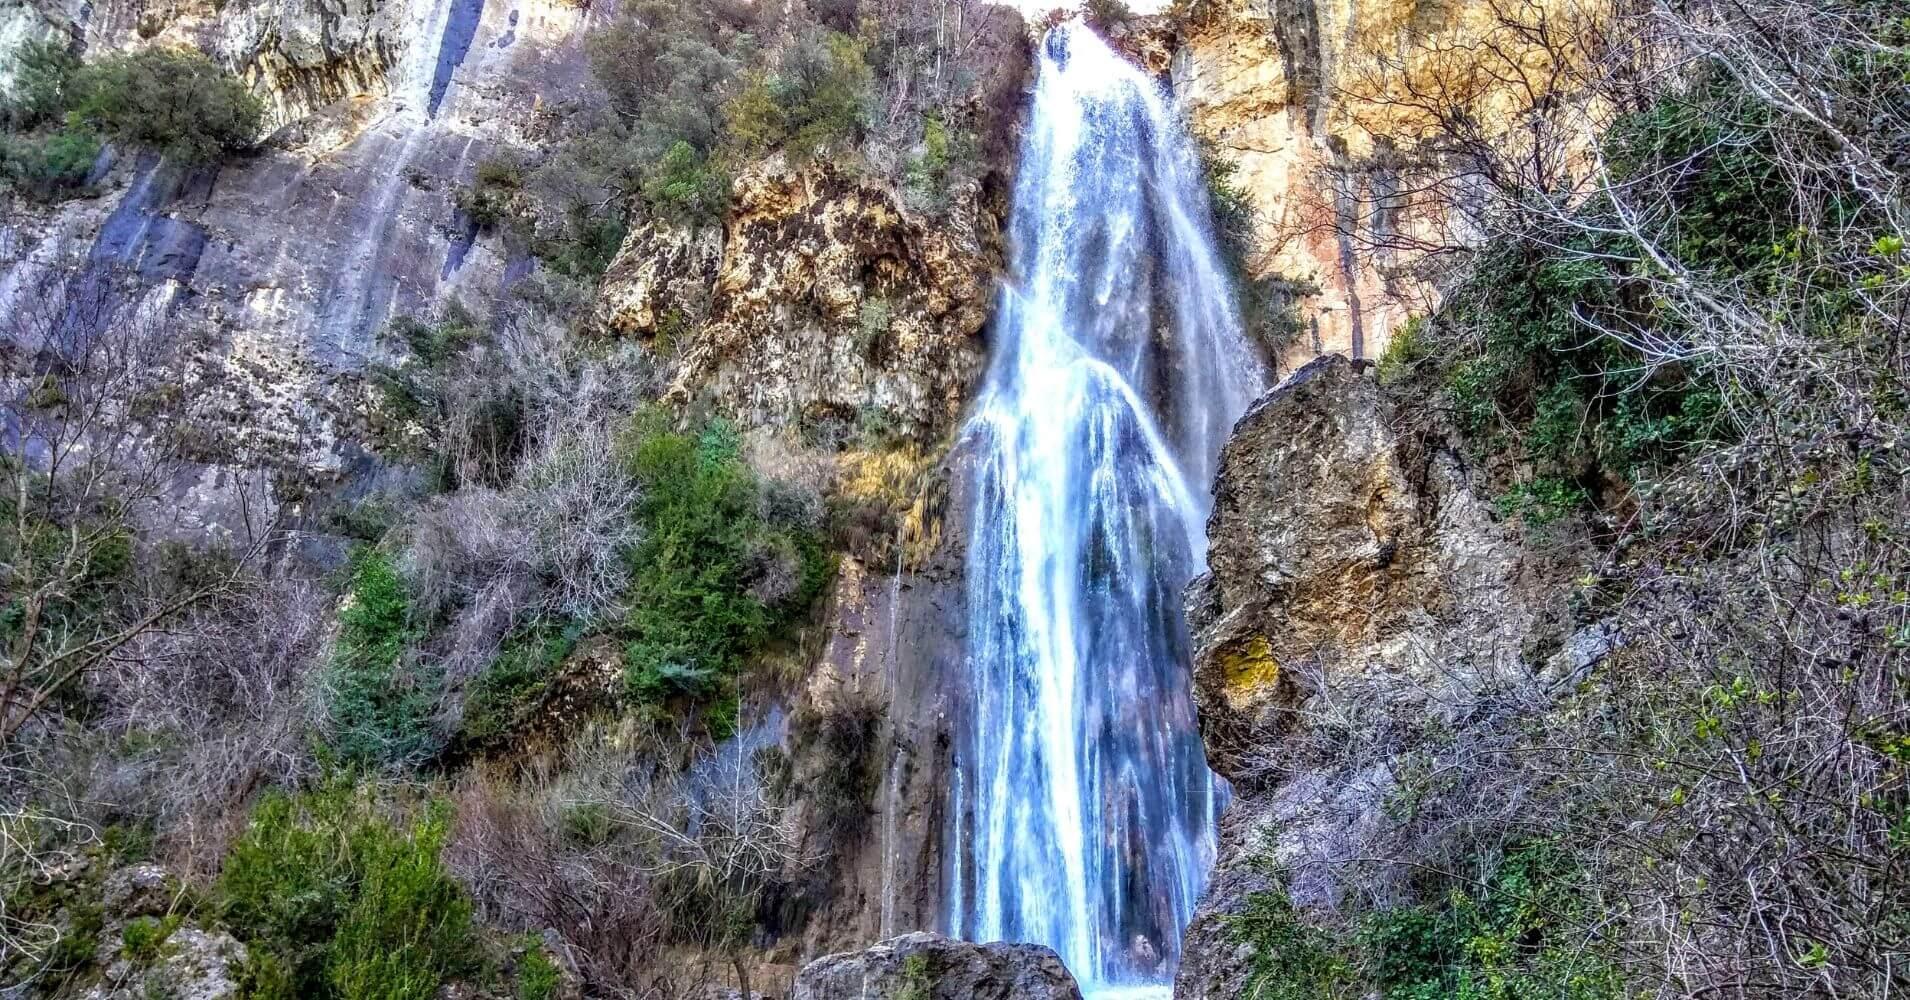 Cascada de Chorrogil. Sierra de Cazorla, Jaén. Andalucía.